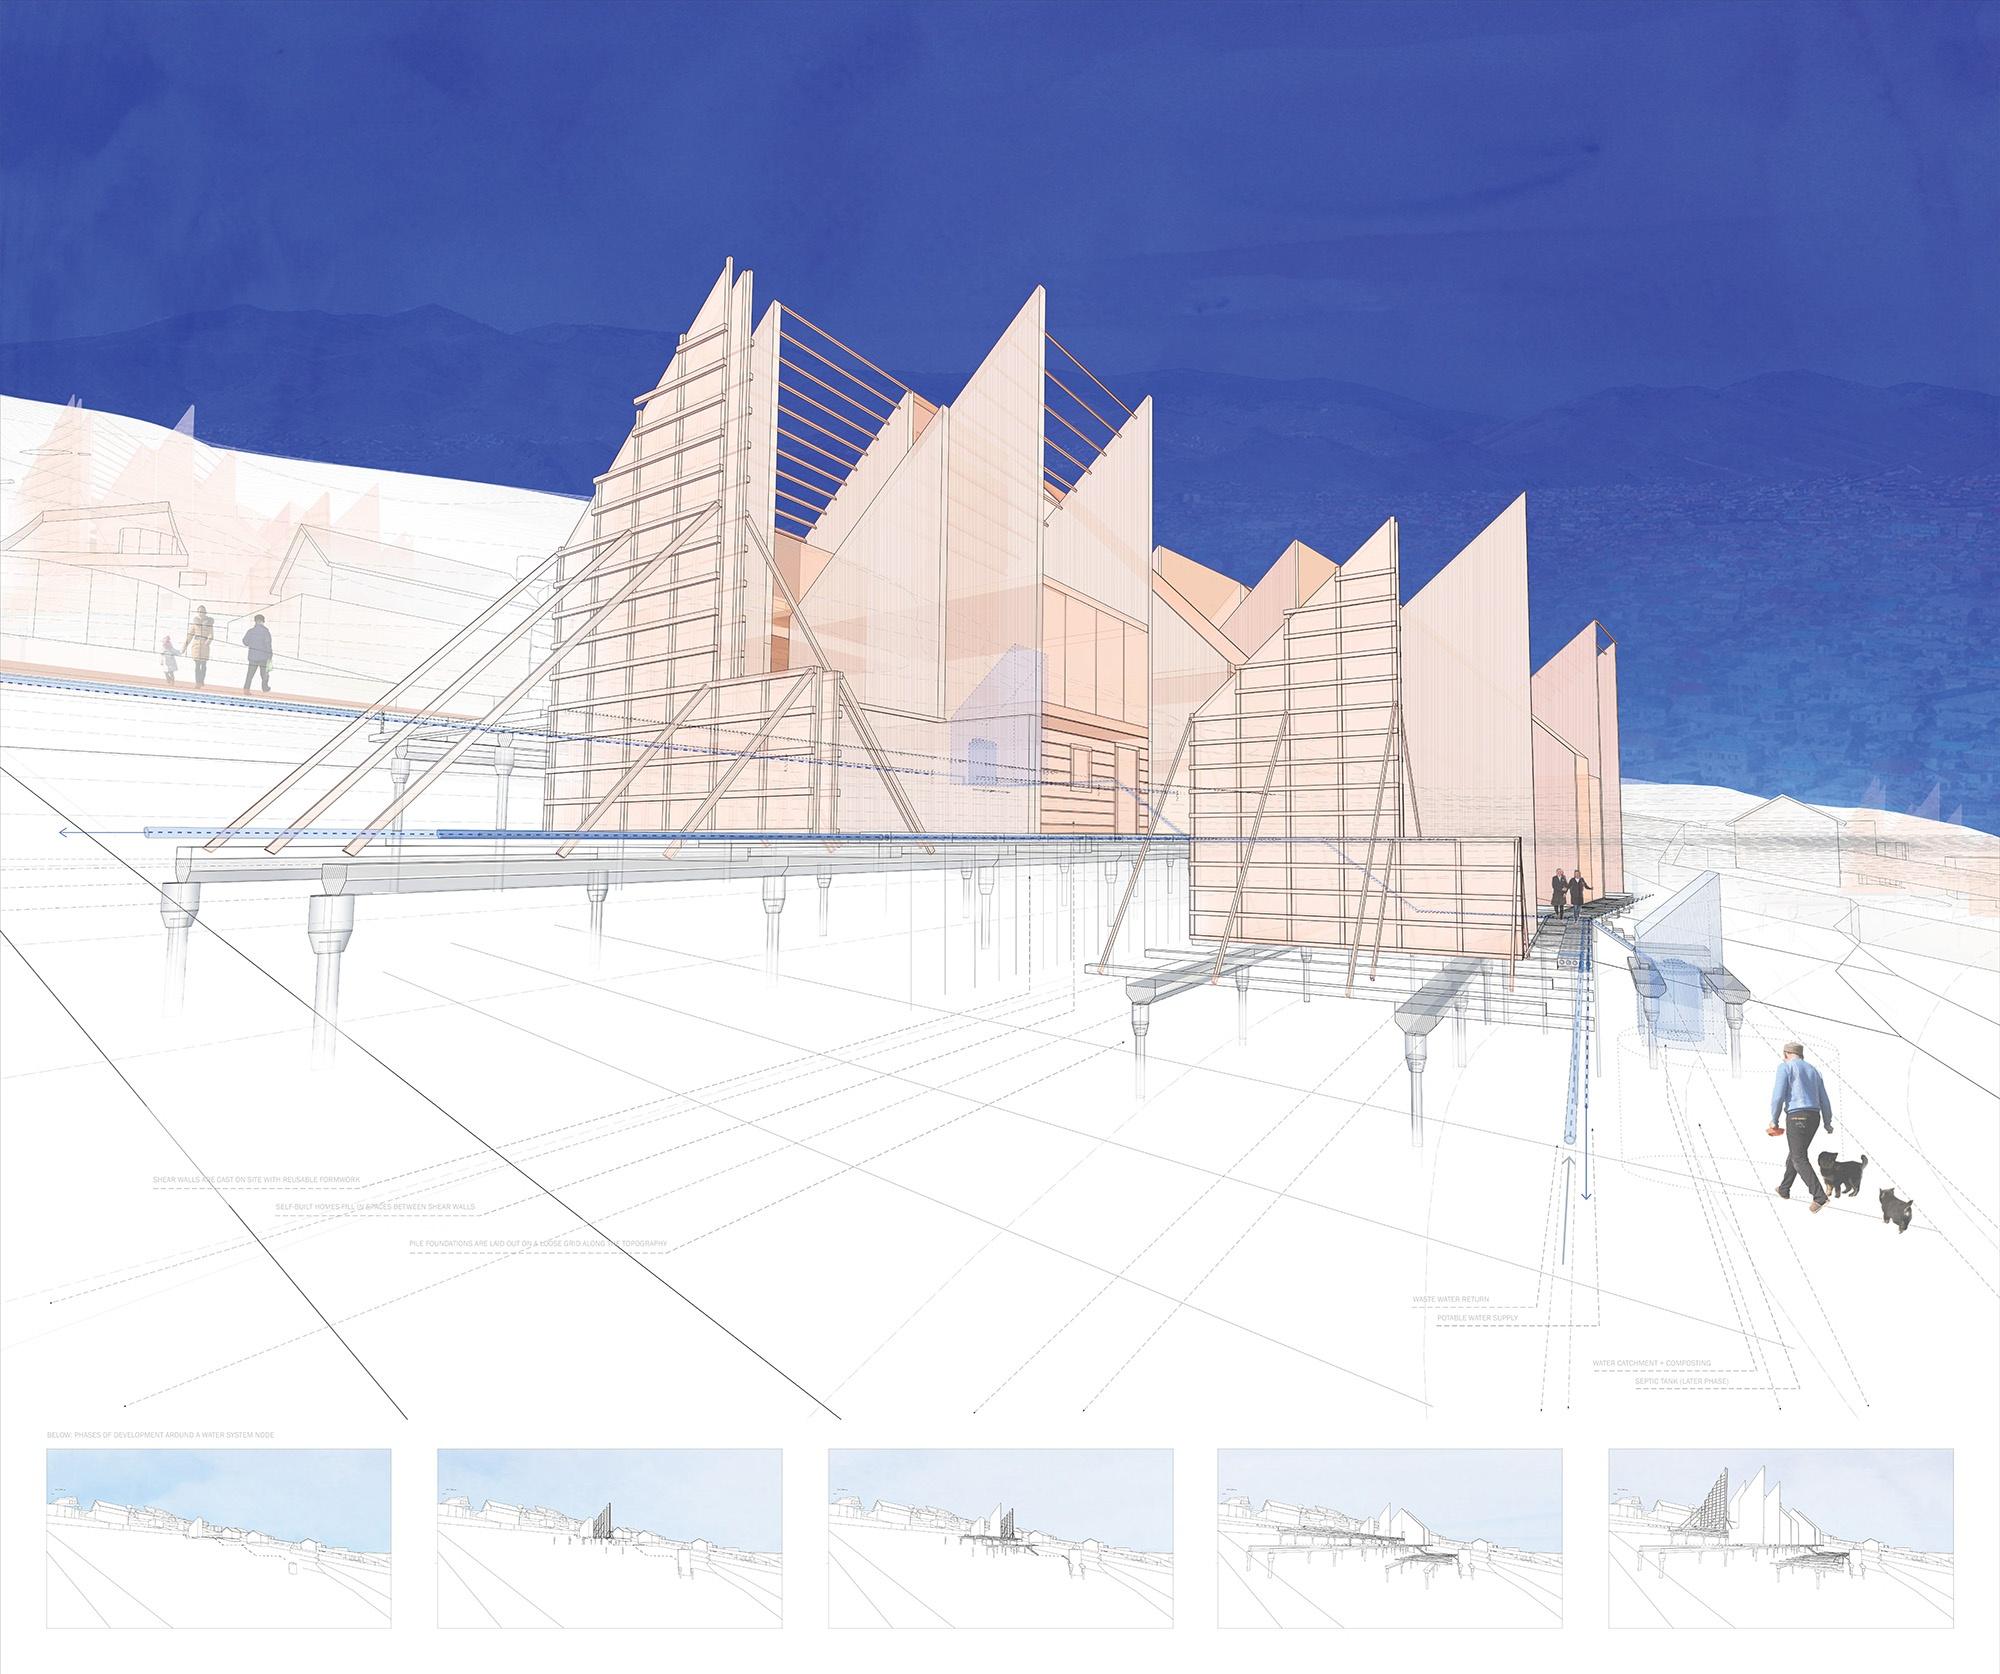 Master Of Architecture - Columbia GSAPP